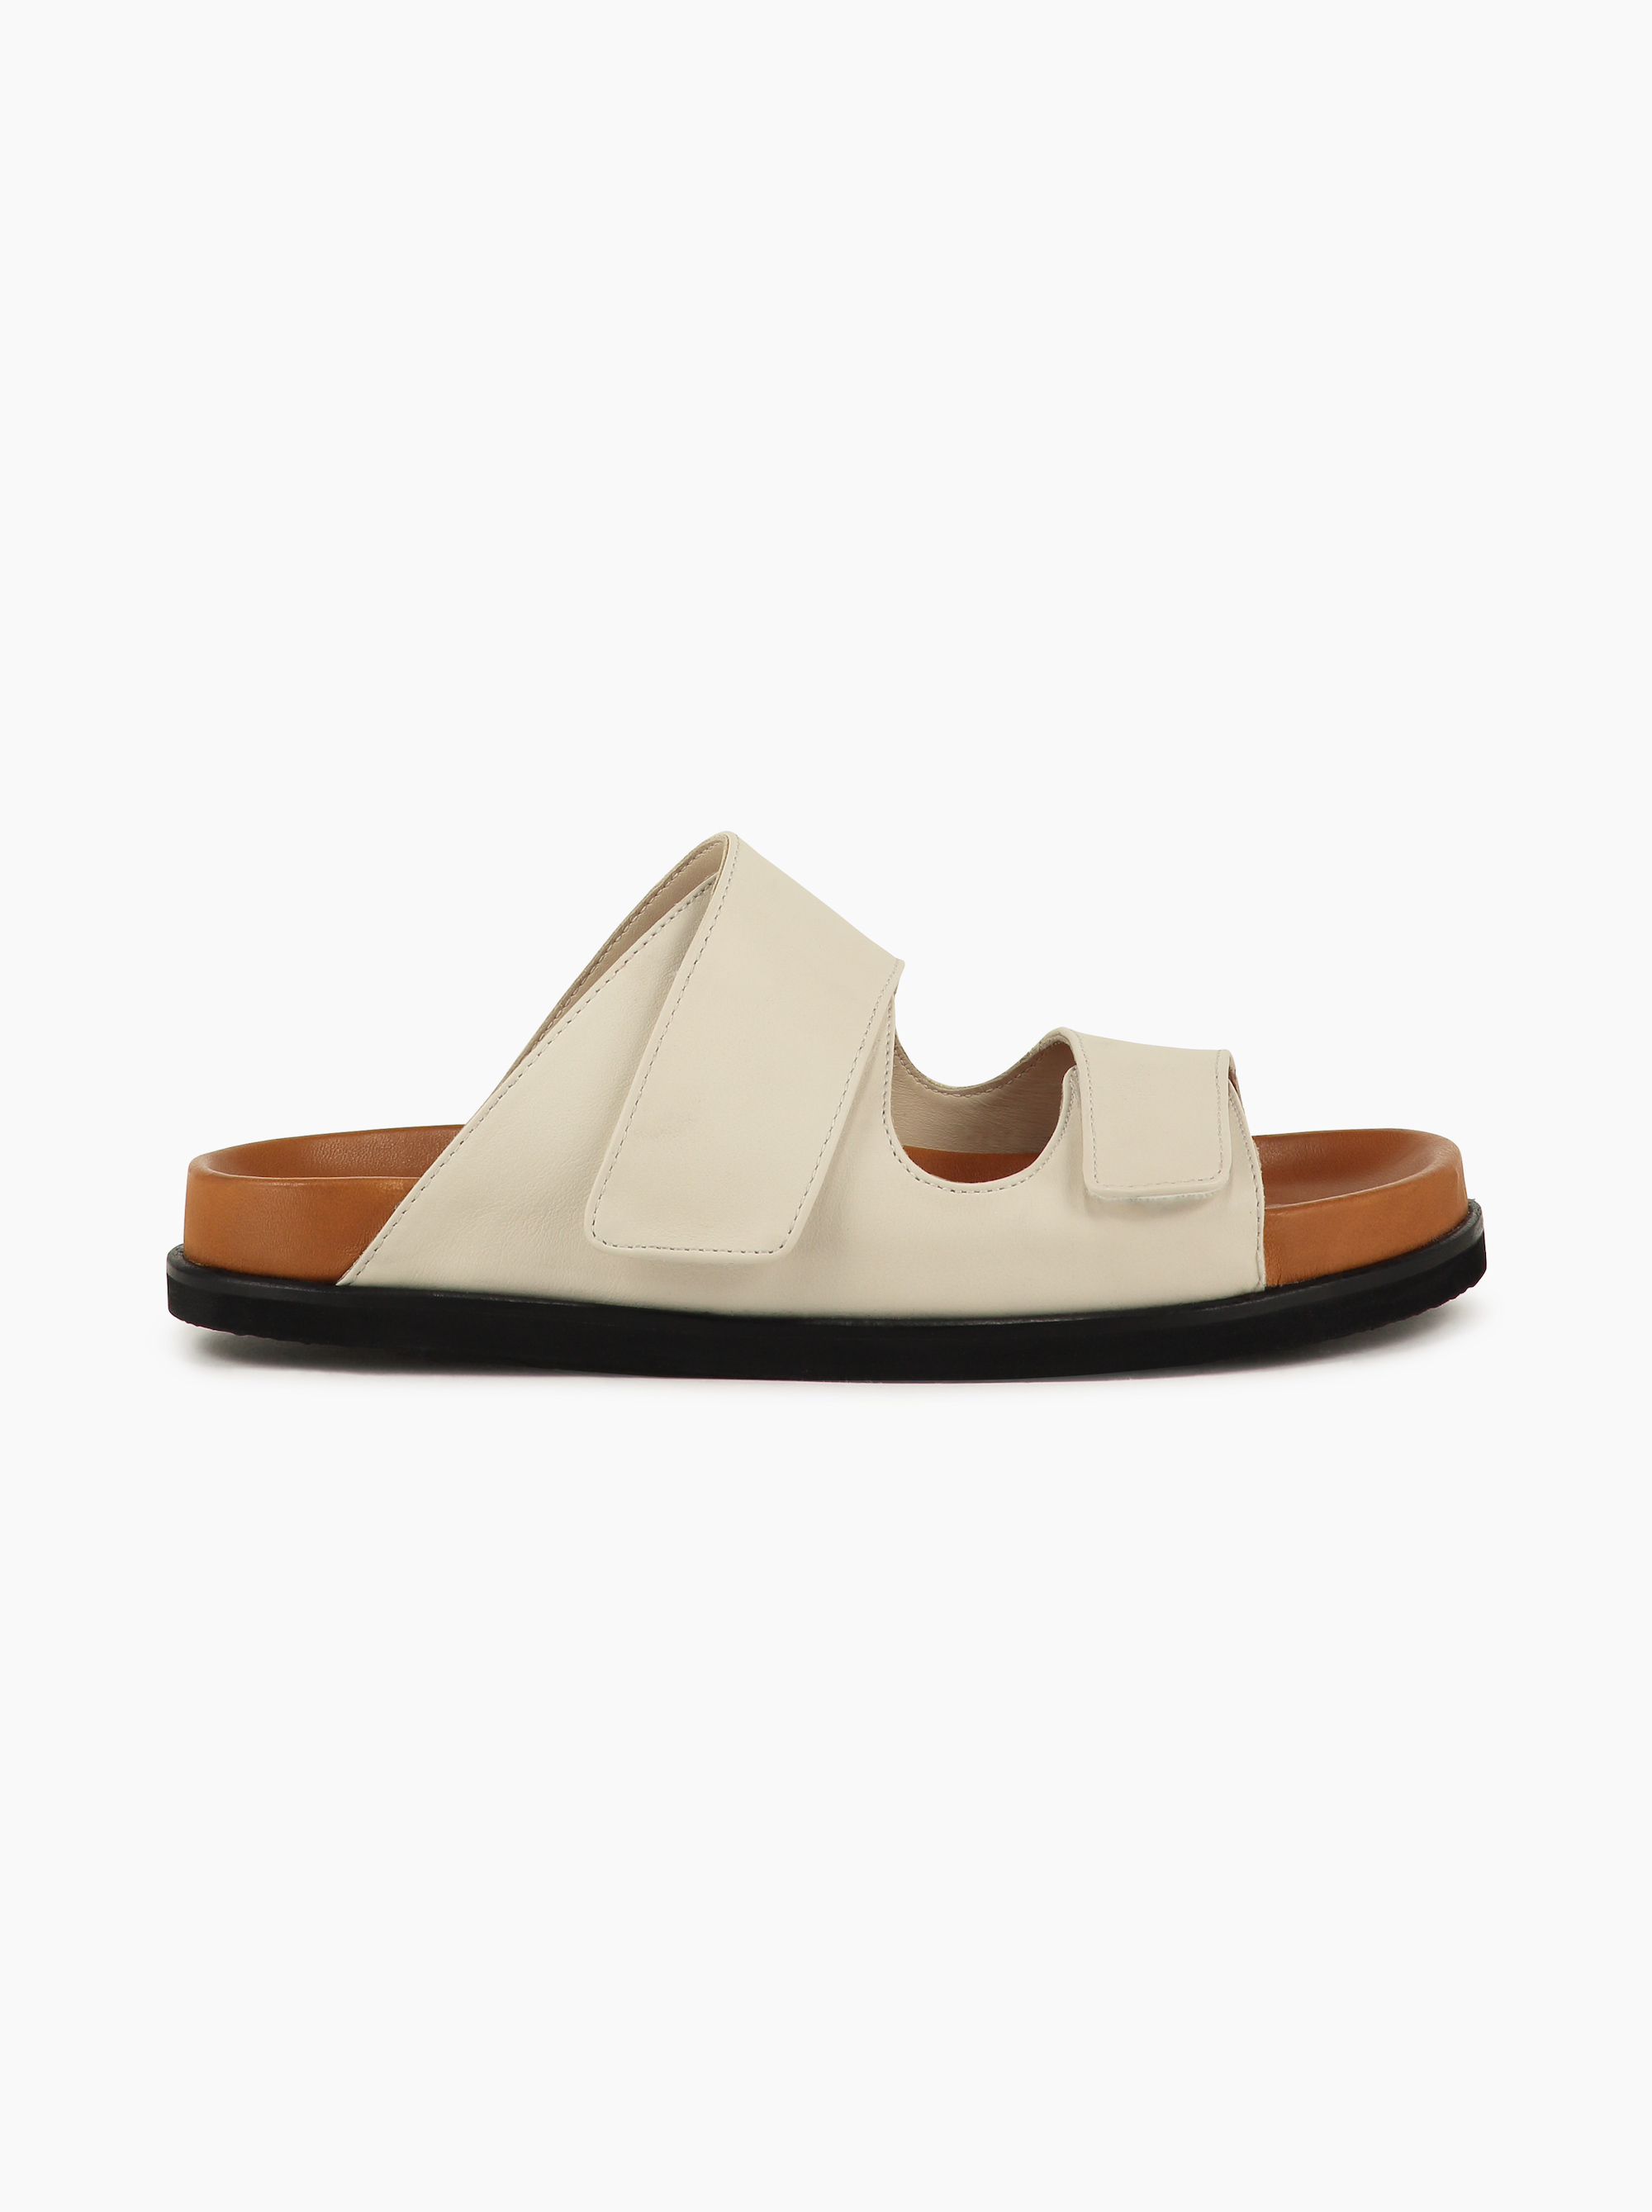 Teym - The Sandal - White - 1b